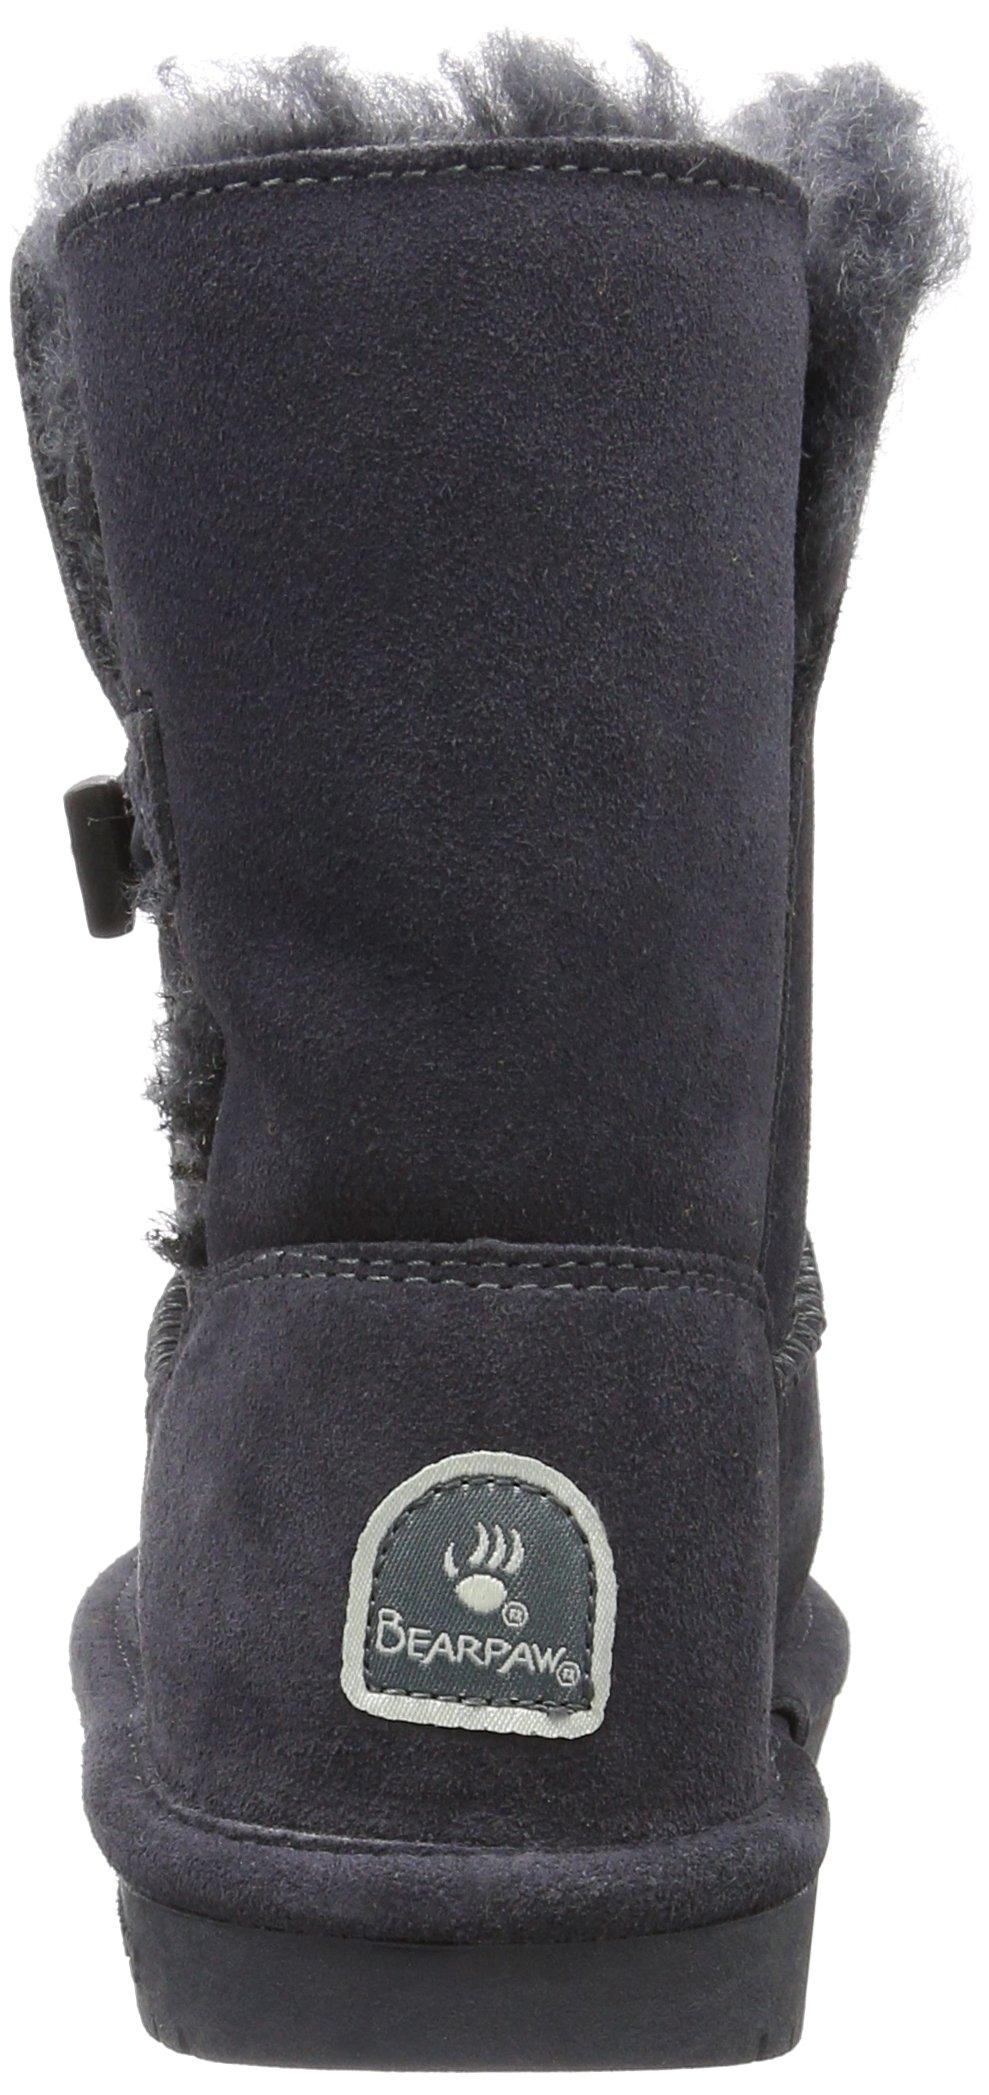 Bearpaw Abigail Charcoal Unisex Kids Shearling Boot Size 1M by BEARPAW (Image #2)